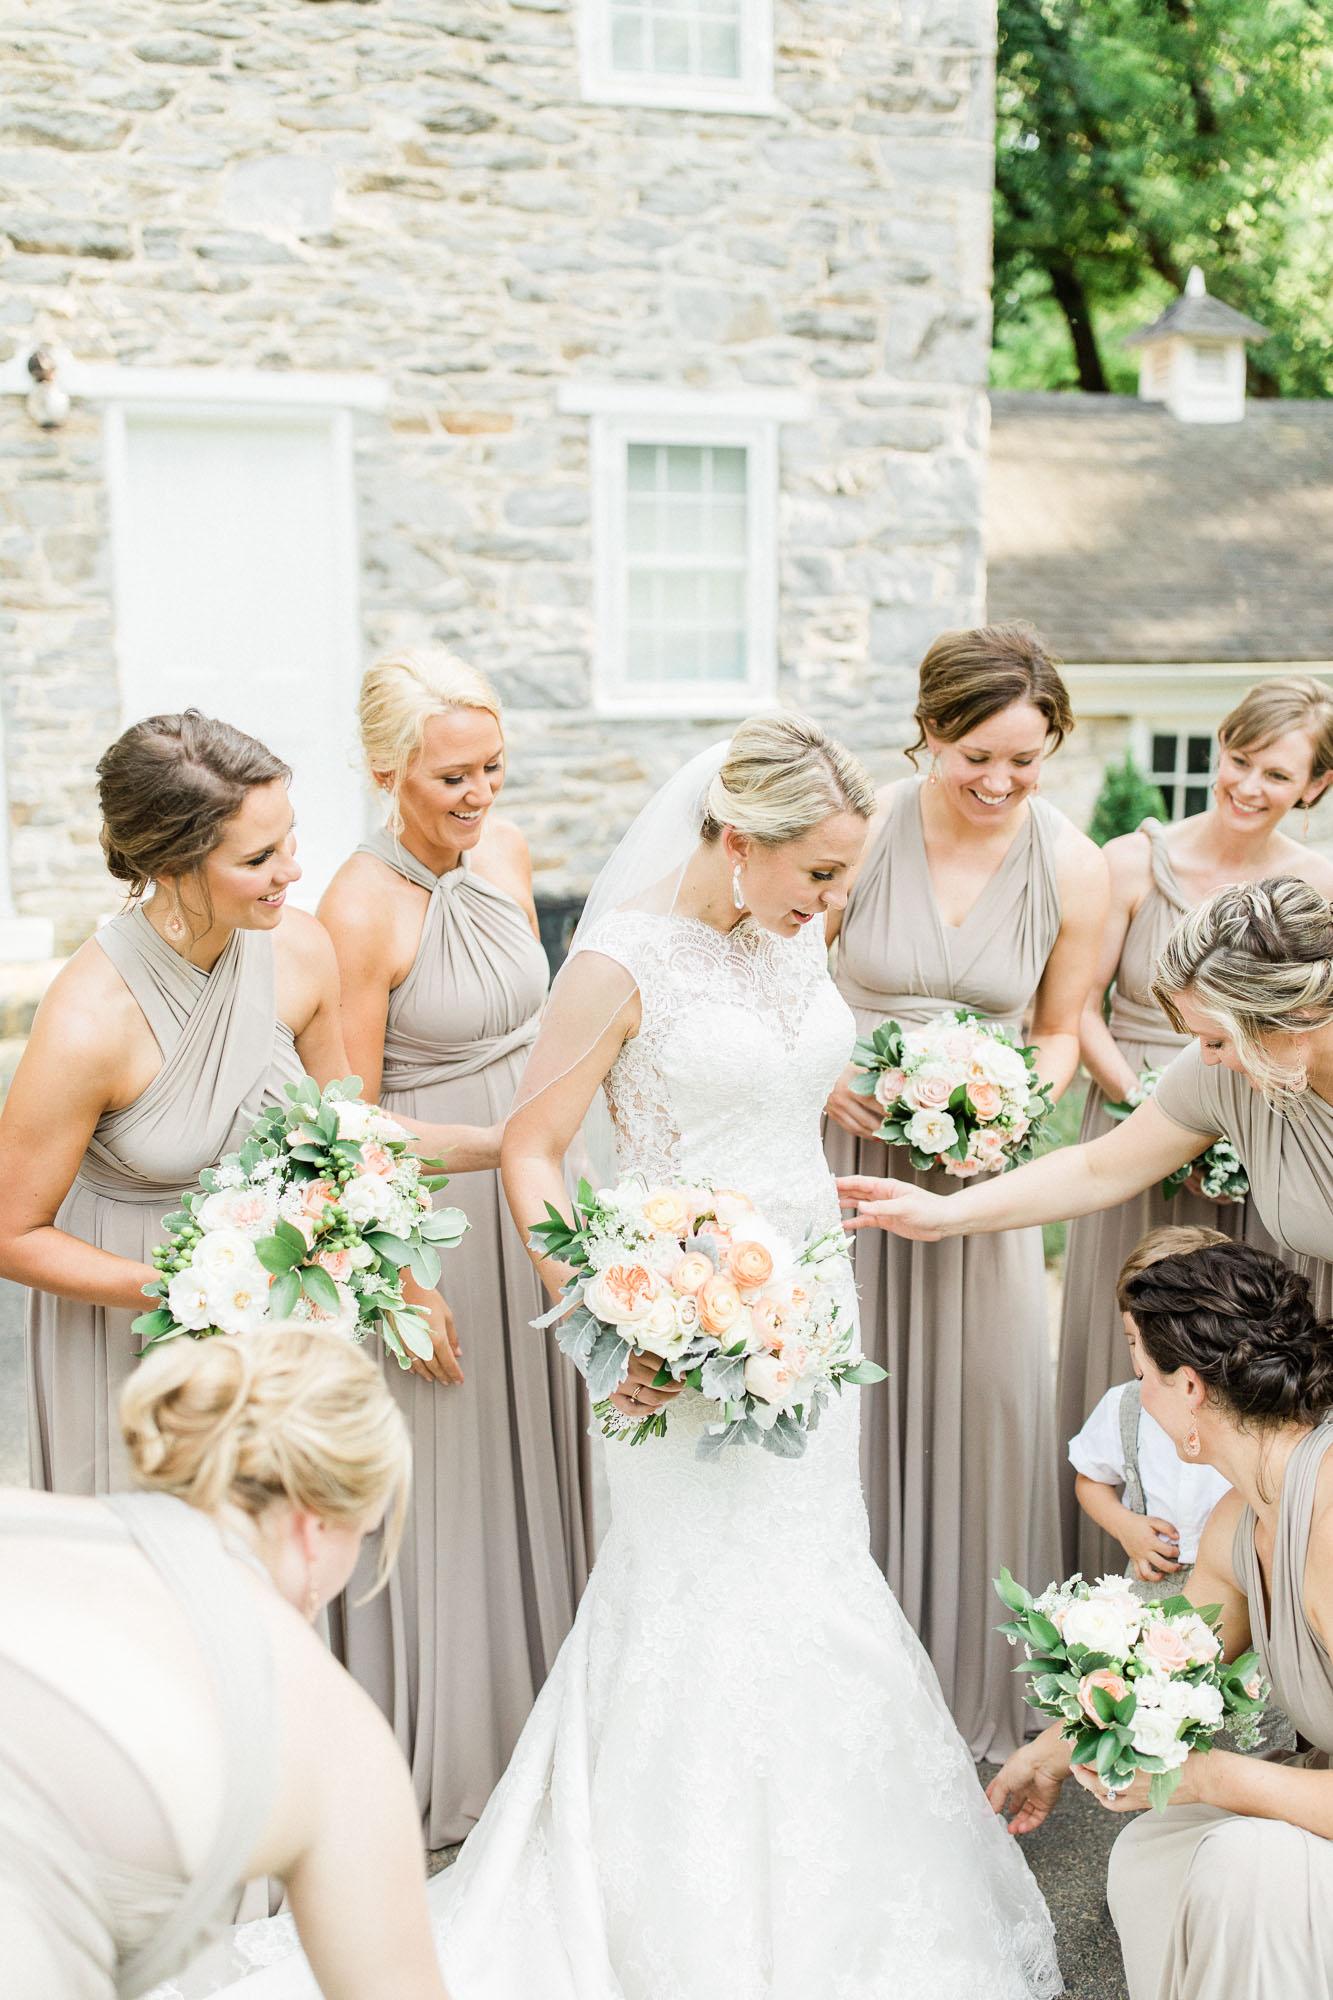 Allenberry-resort-historic-pennsylvania-wedding-10197.jpg